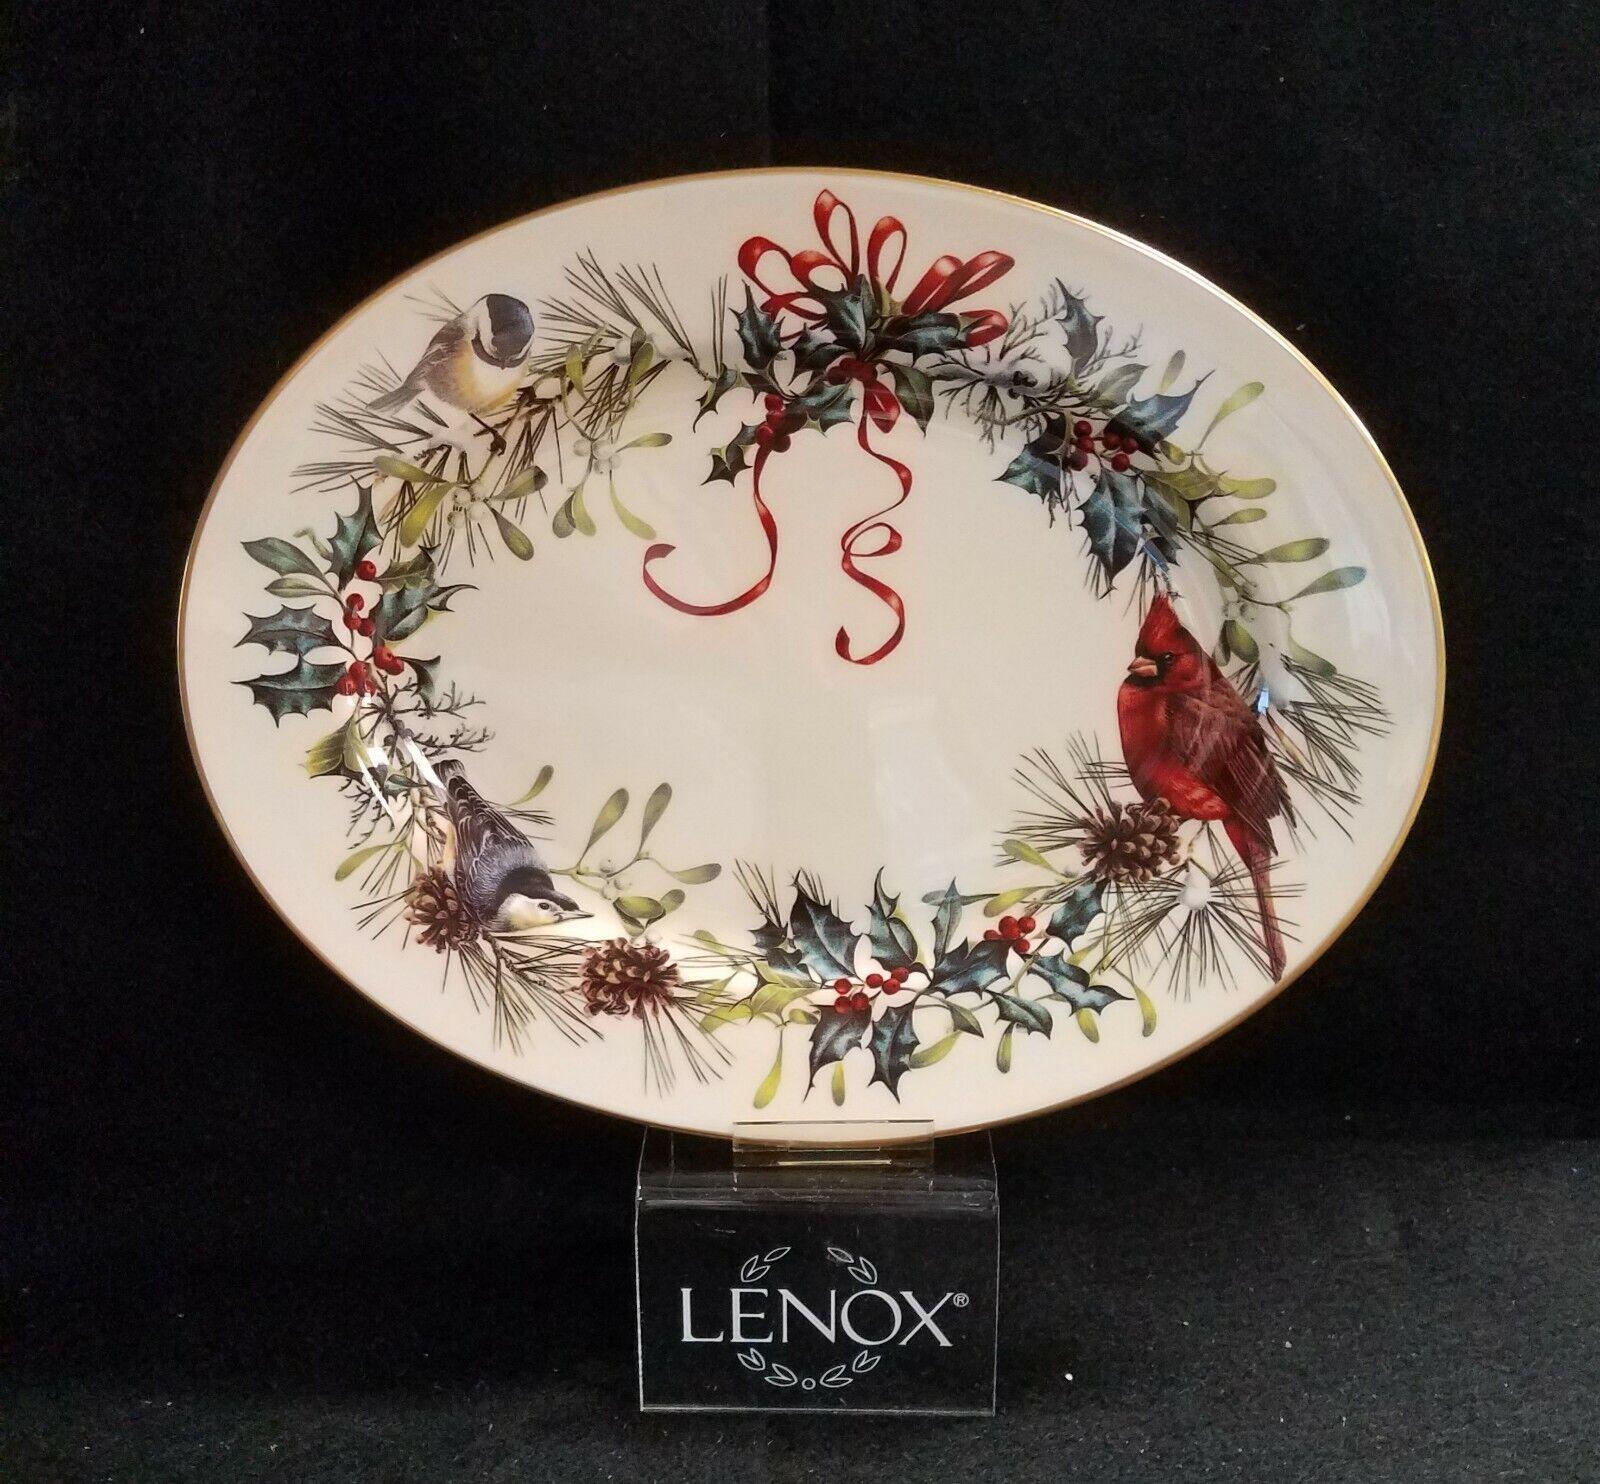 LENOX WINTER GREETING Oval Platter 13  - $149.95